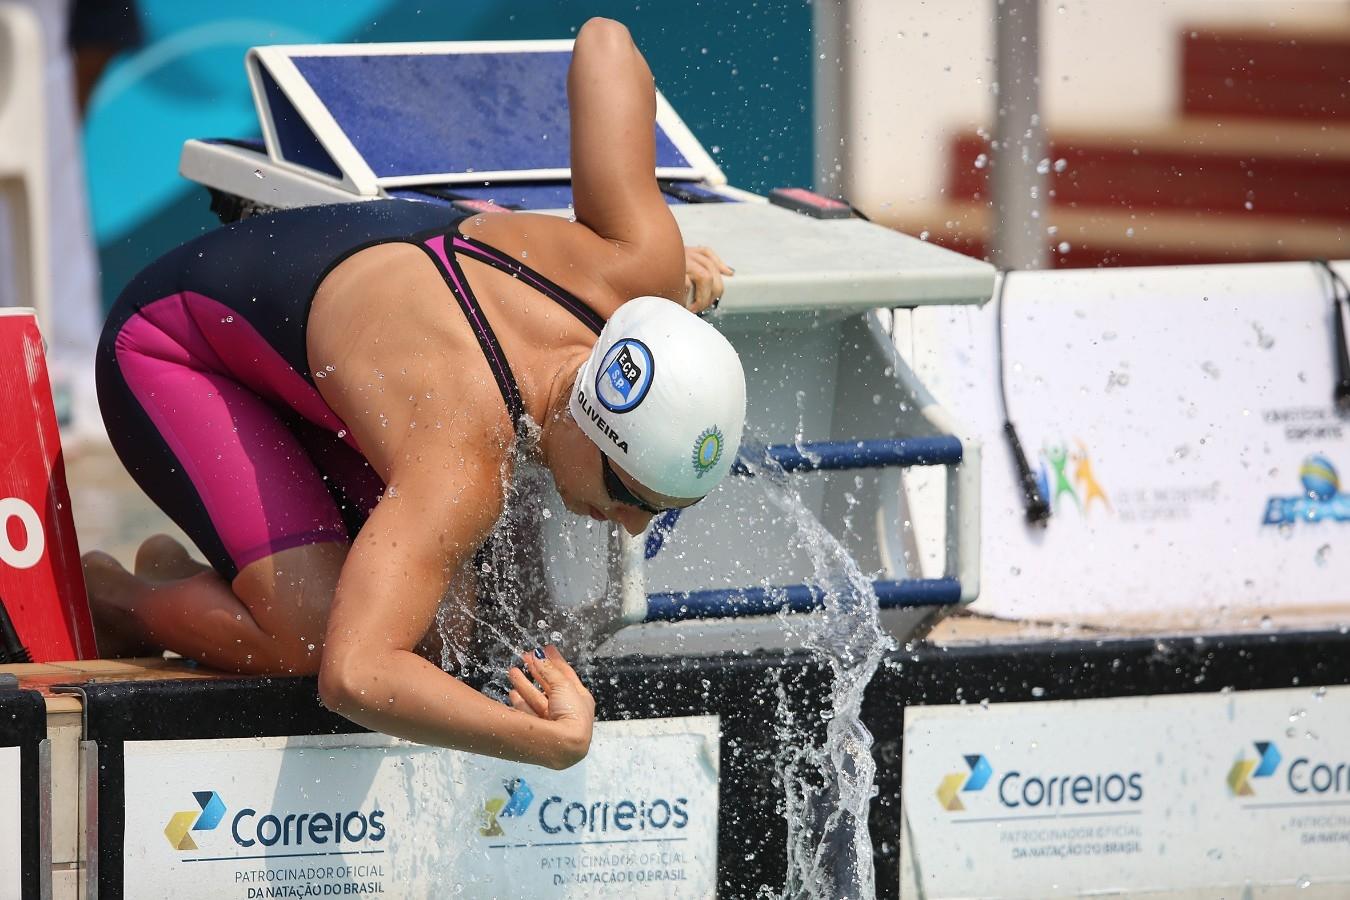 Larissa Oliveira - Trofeu Jose Finkel de Natacao no Clube Internacional de Regatas. 14 de Setembro de 2016, Santos, SP, Brasil. Foto:Satiro Sodré/SSPress.